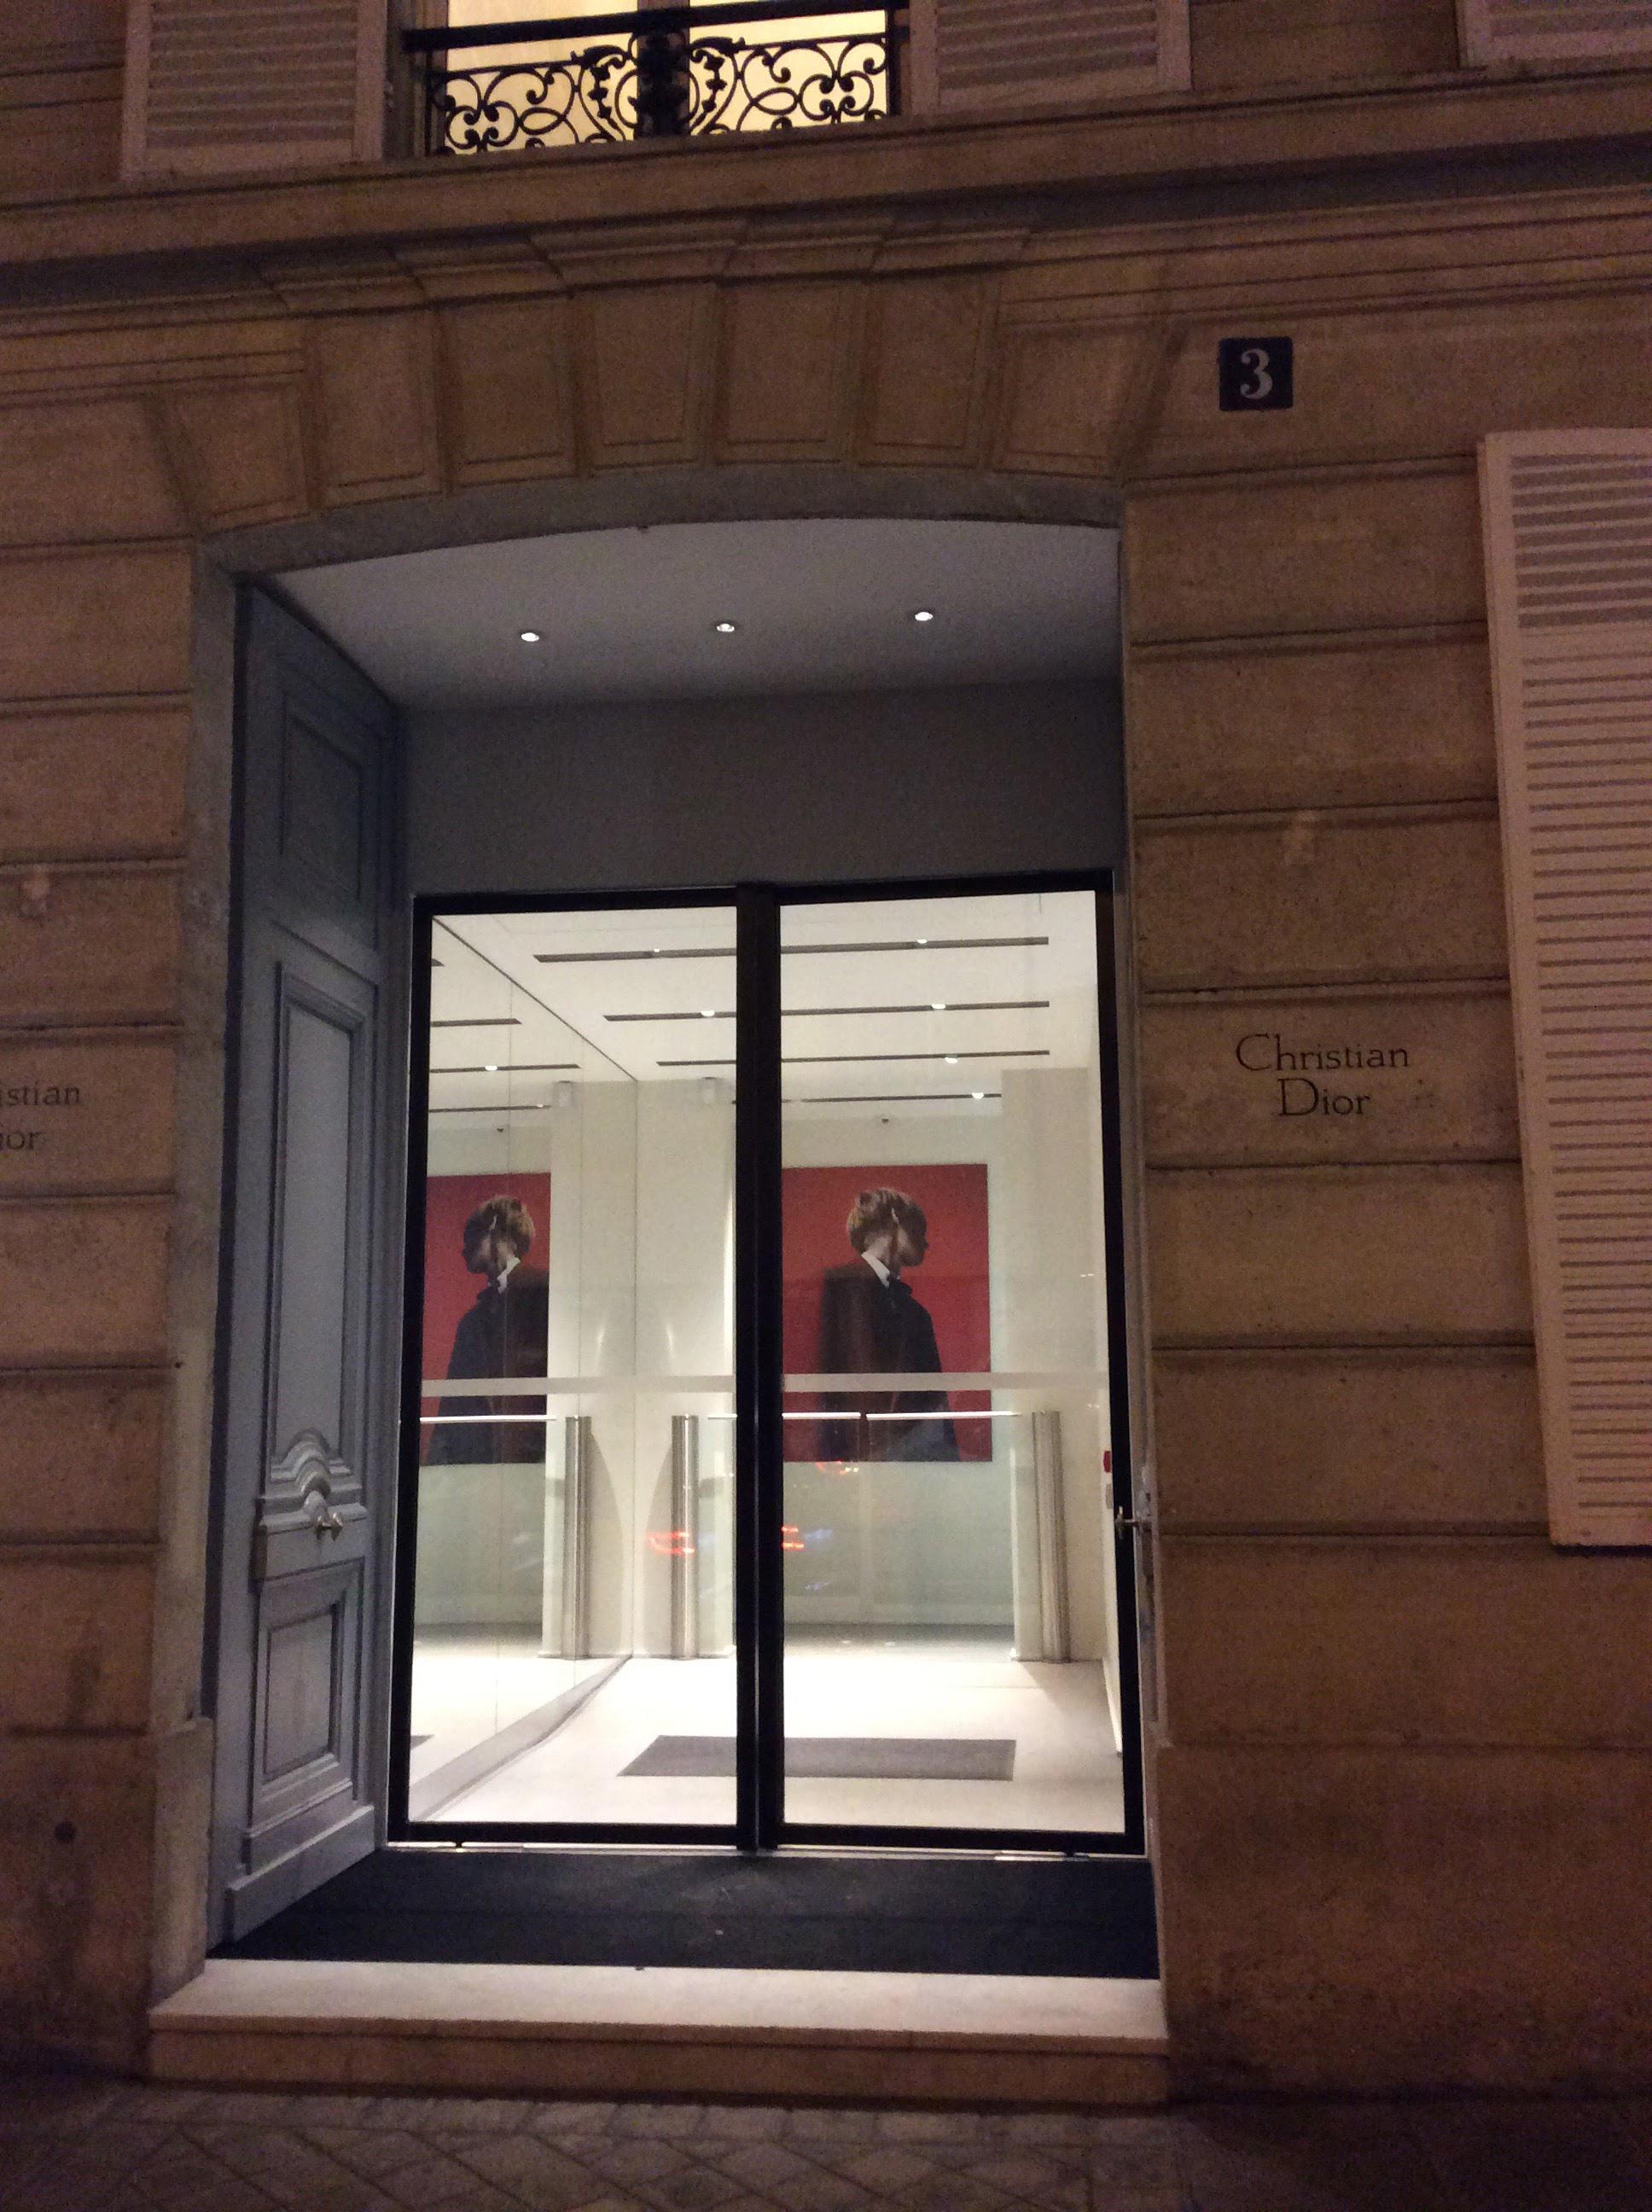 Avenue Montaigne Paris Fashion Windows - Dior